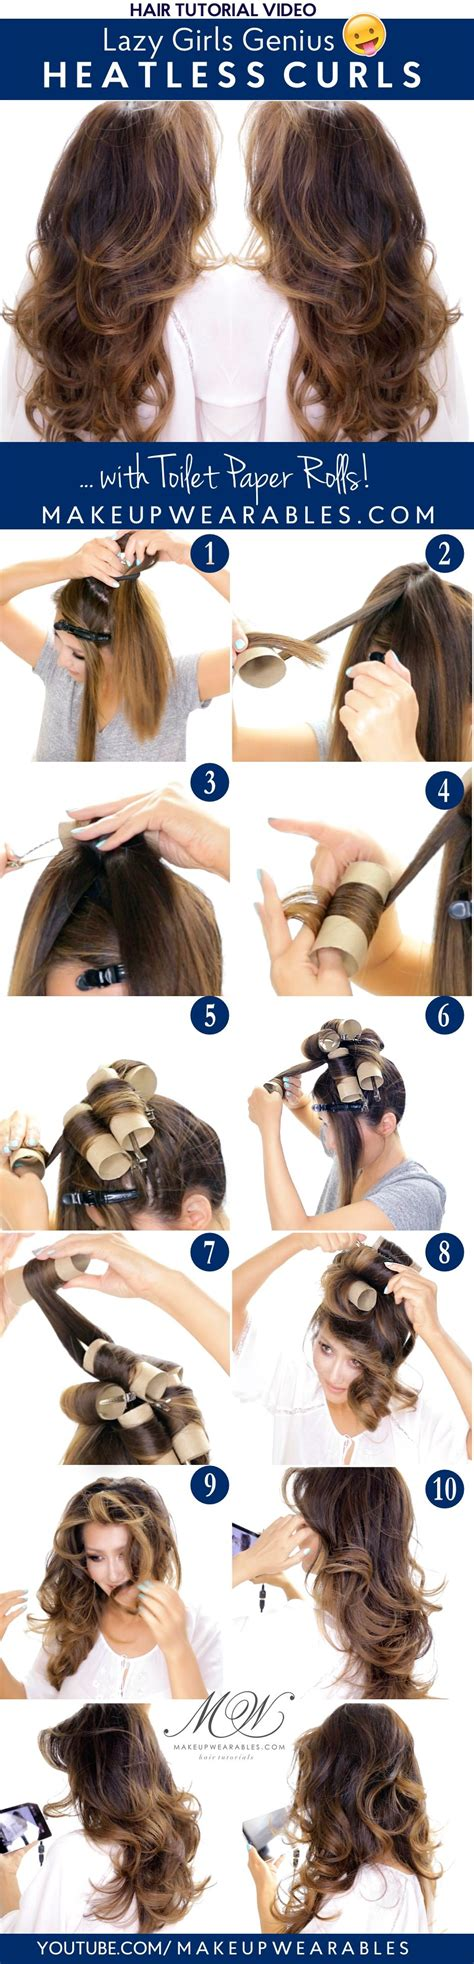 hairstyles for overnight curls lazy girls genius heatless curls overnight tutorial